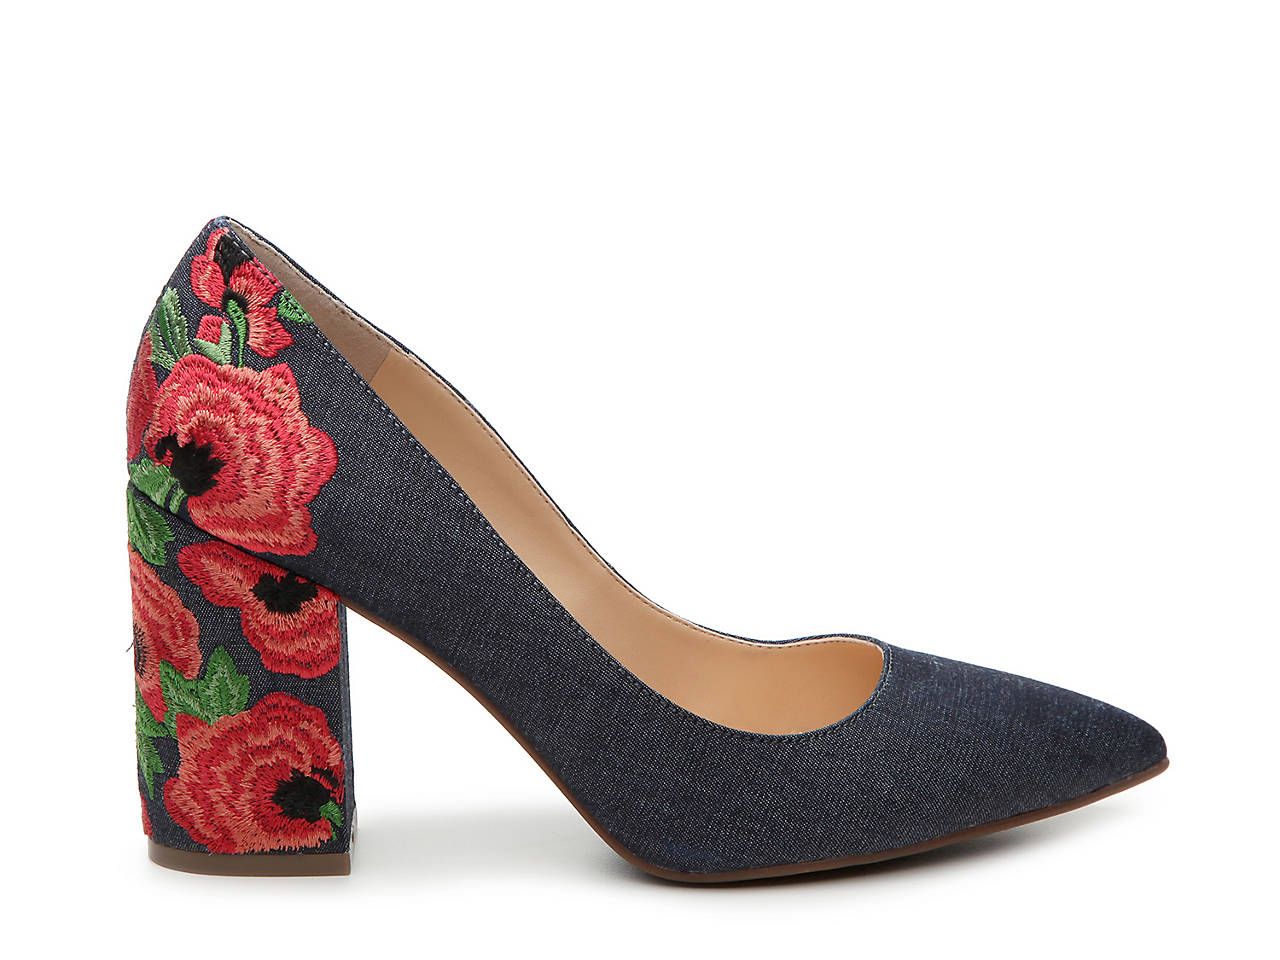 8917f04fb199a Jessica Simpson Lannah Pump Women s Shoes